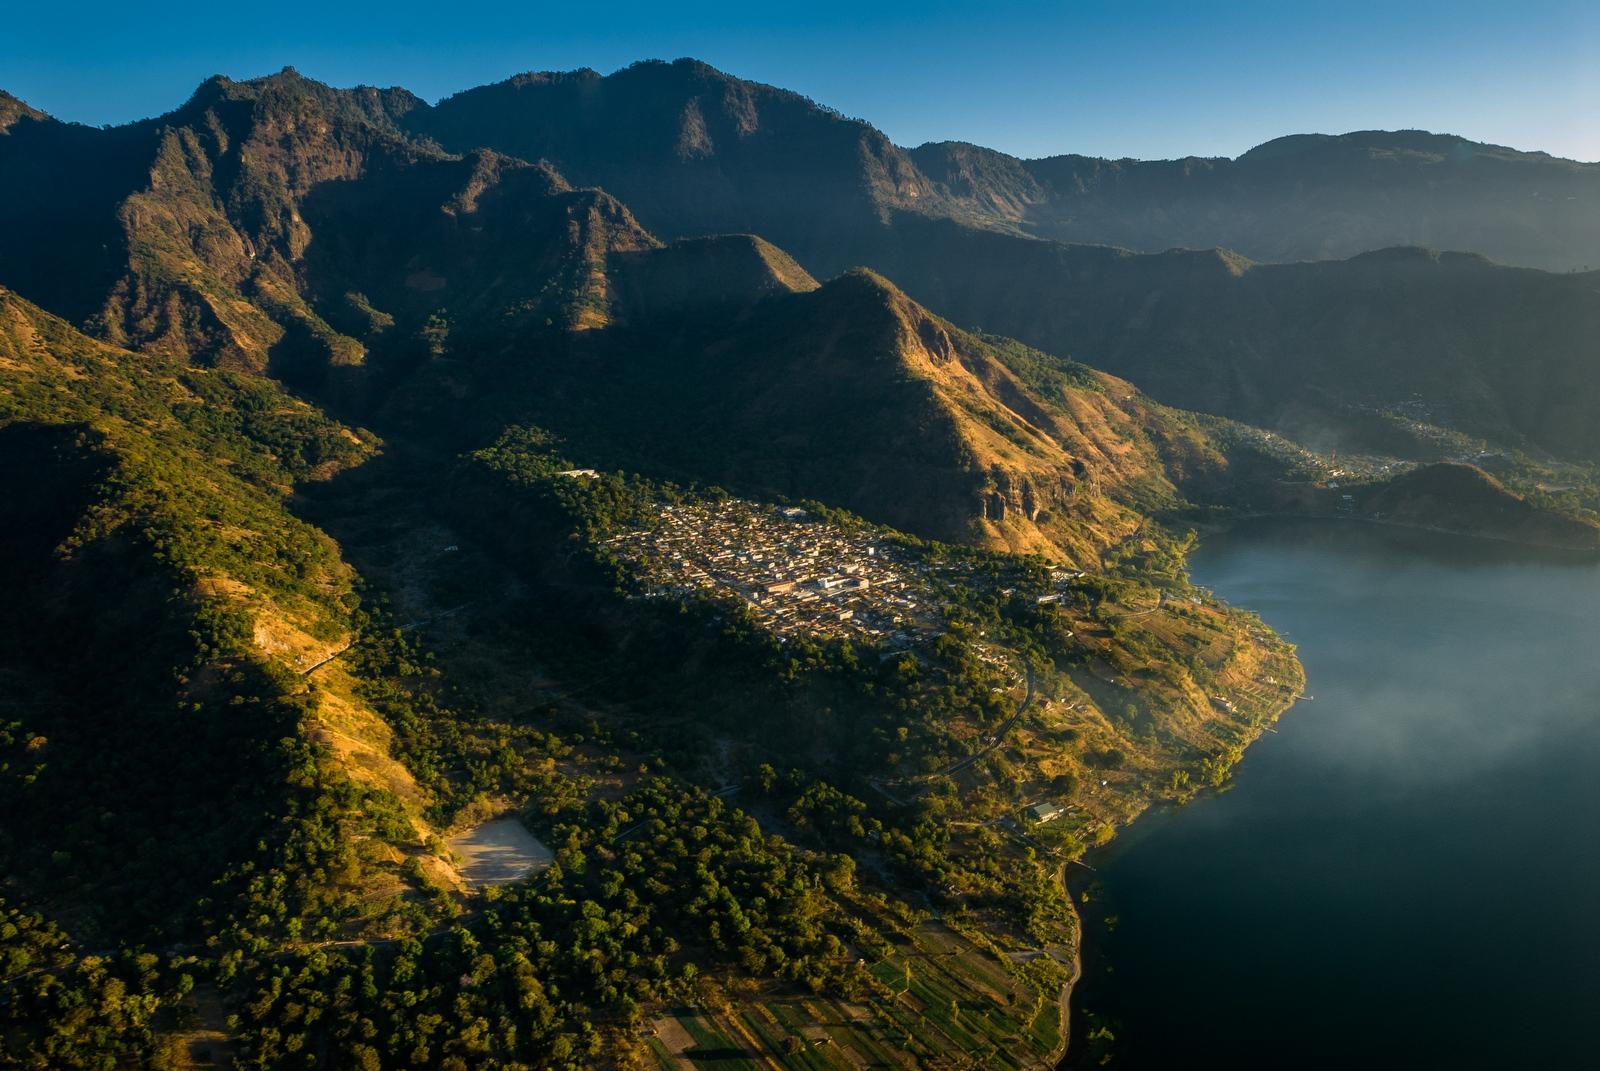 The town ofSan Pablo La Laguna on the shores ofLake Atitlán, Guatemala.